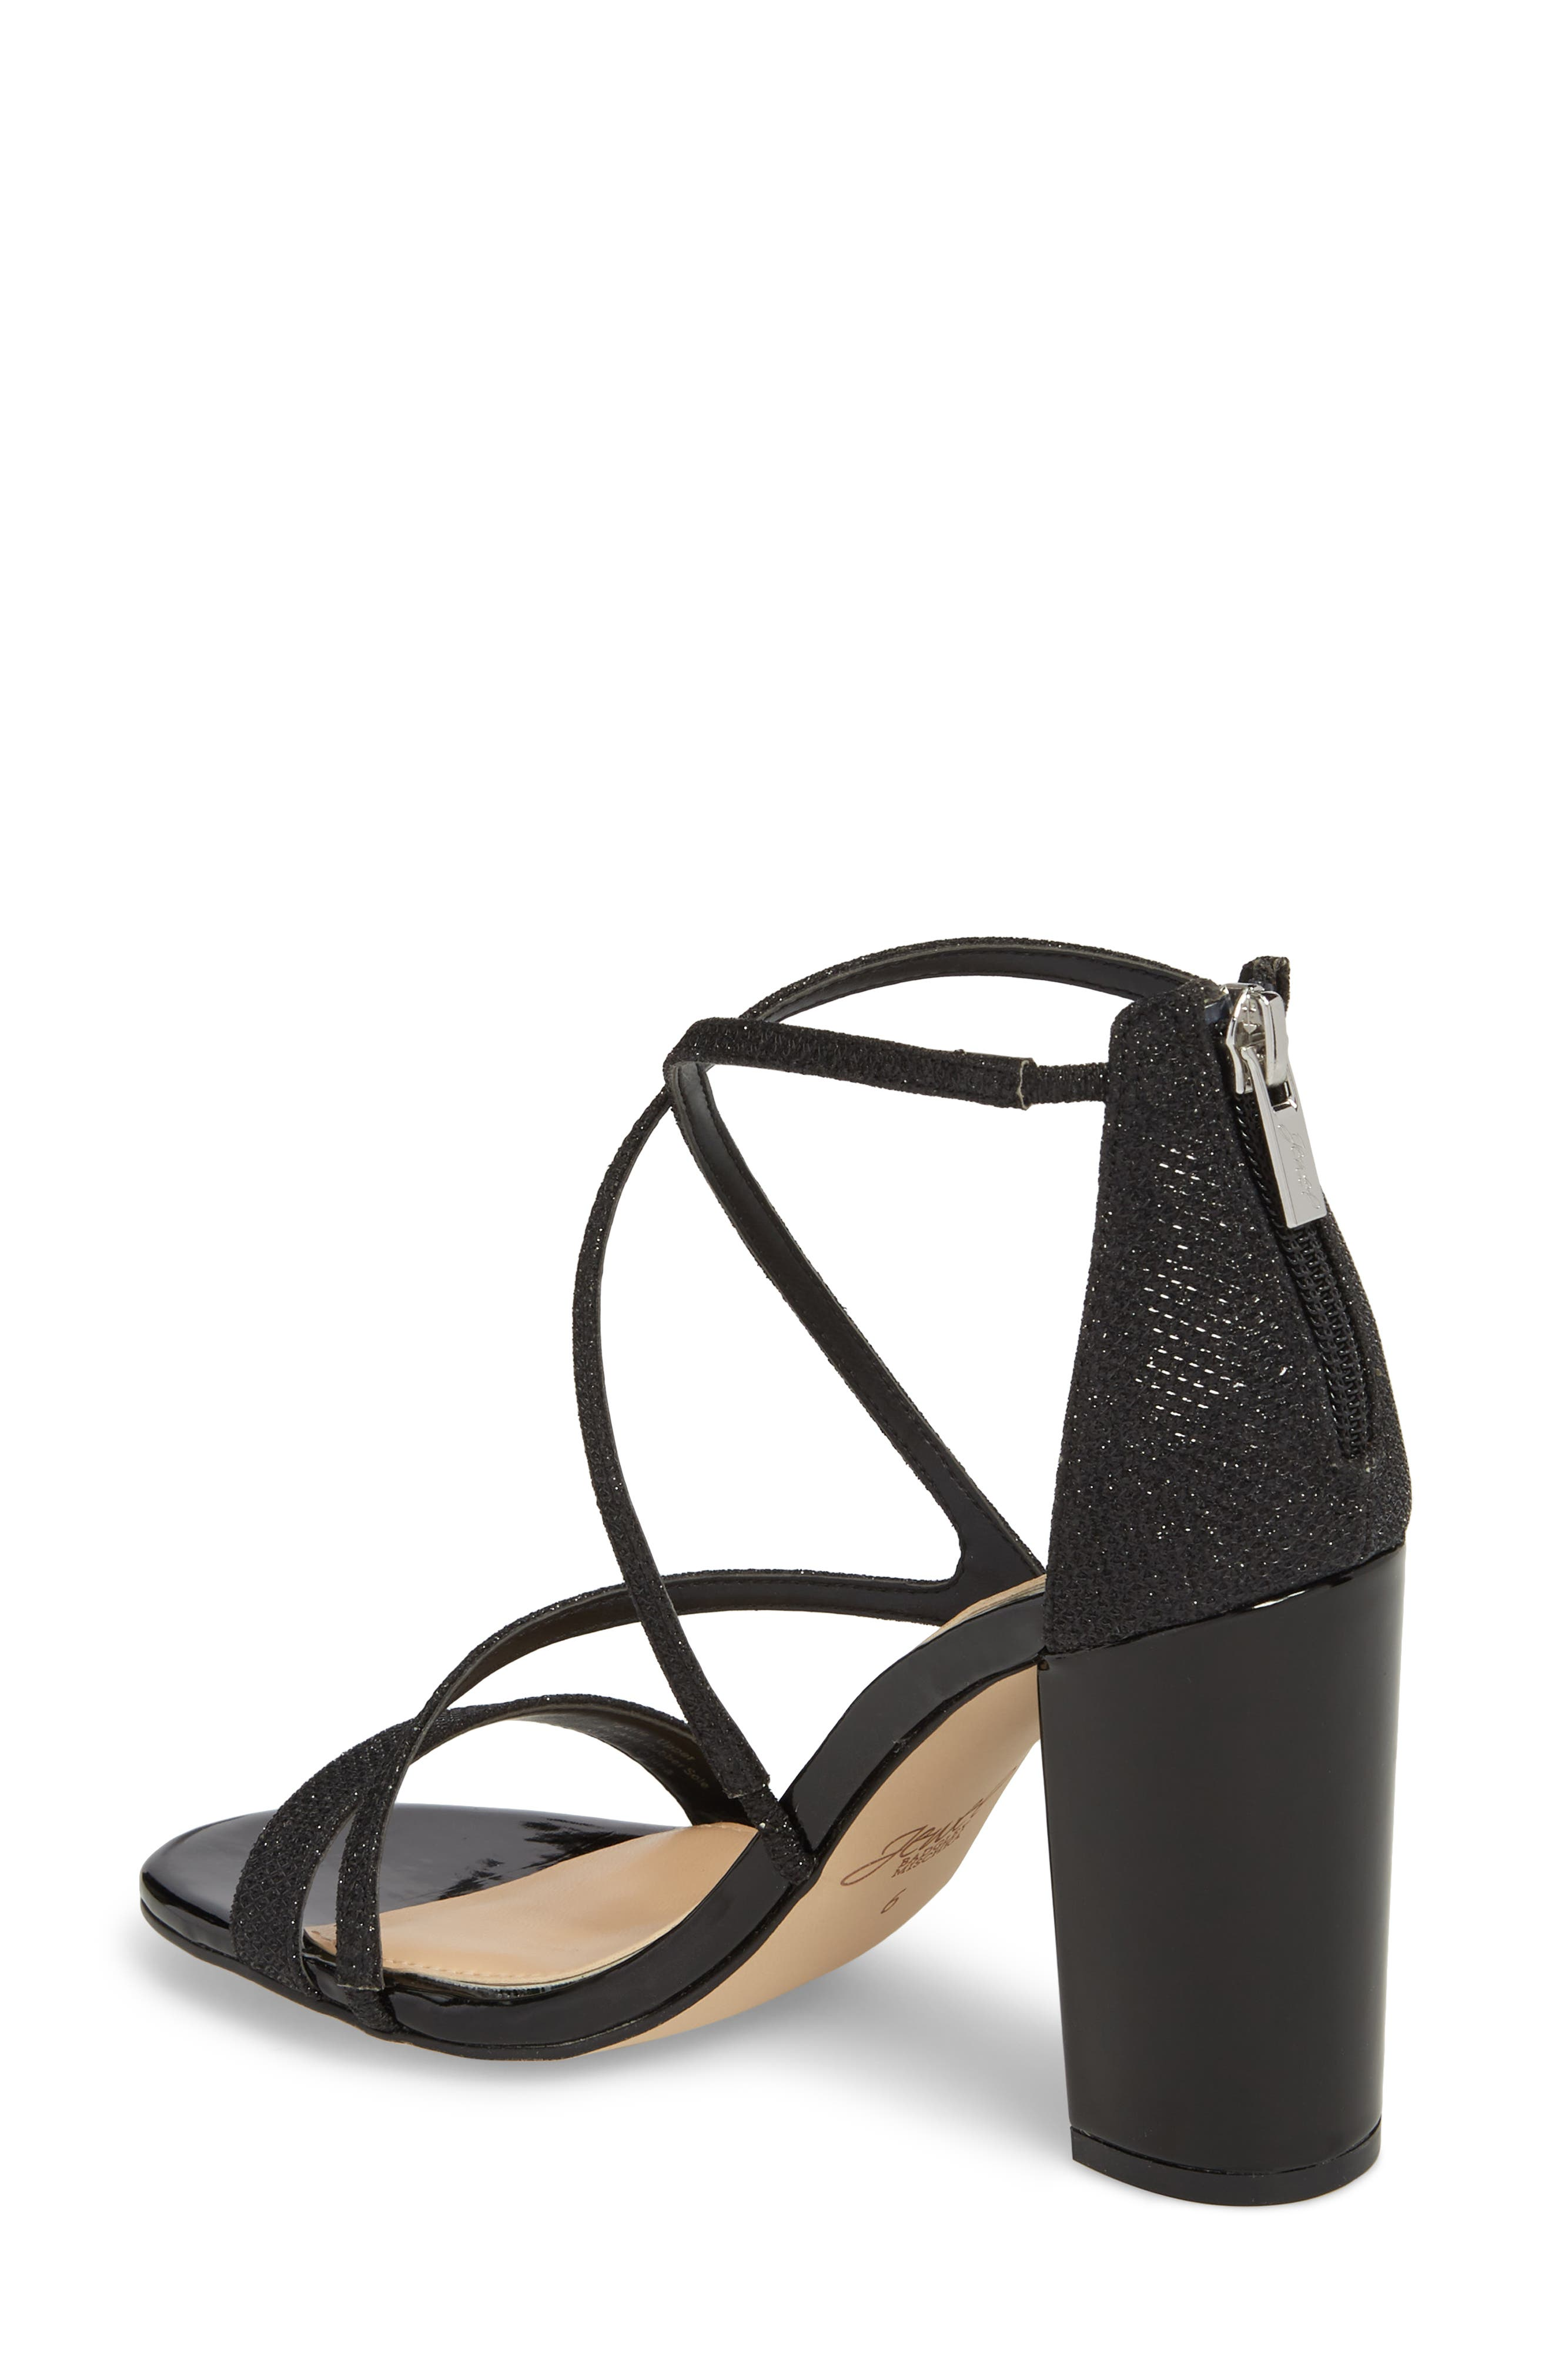 Badgley Mischka Gale Block Heel Sandal,                             Alternate thumbnail 2, color,                             BLACK GLITTER FABRIC